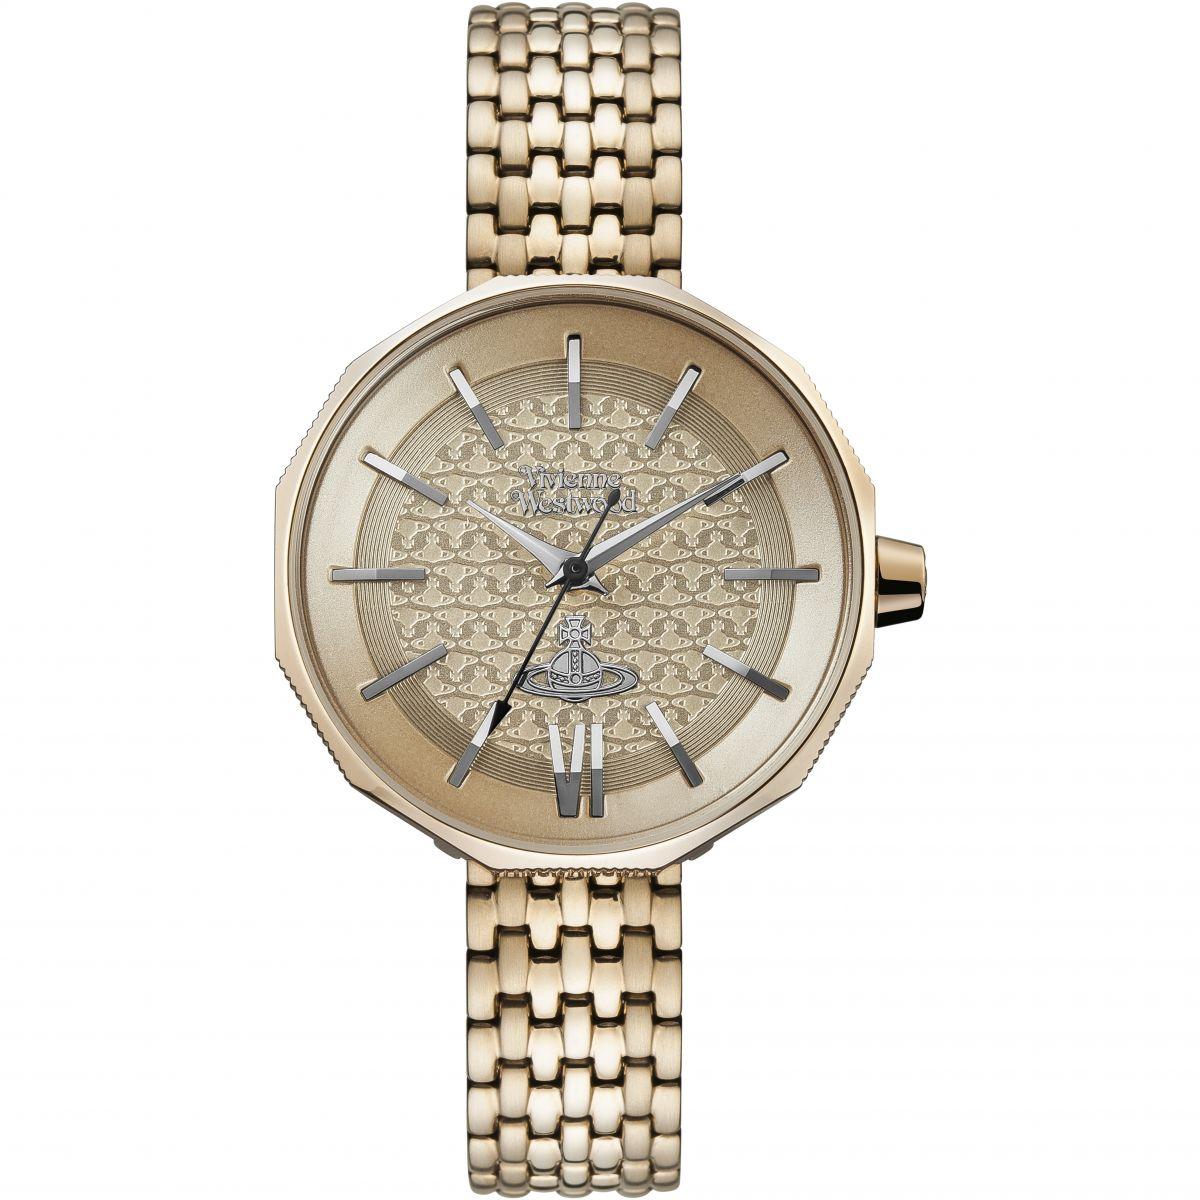 Vivienne Westwood ヴィヴィアンウエストウッド 腕時計 VV171NUNU レディース【最新モデル】